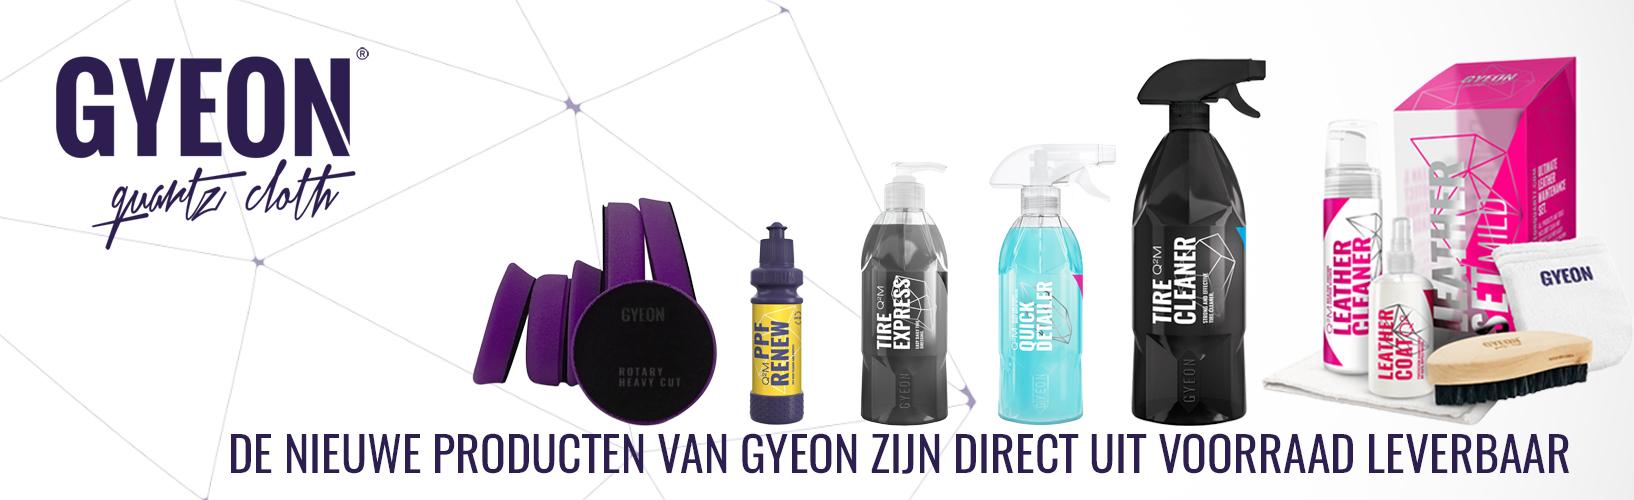 GYEON quartz New Products